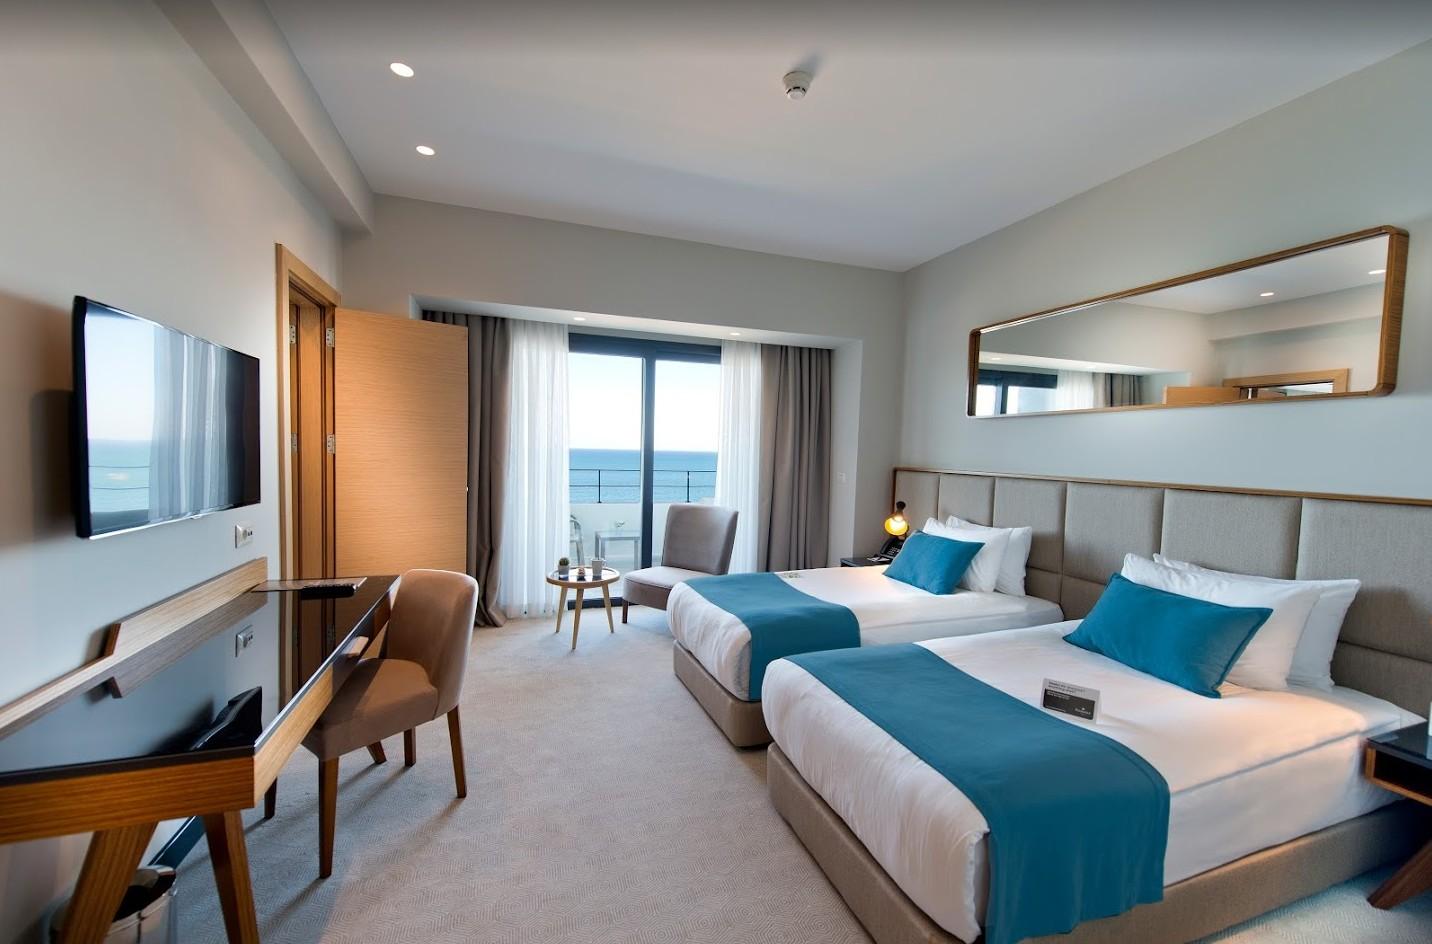 Ramada Plaza Hotel & Spa2